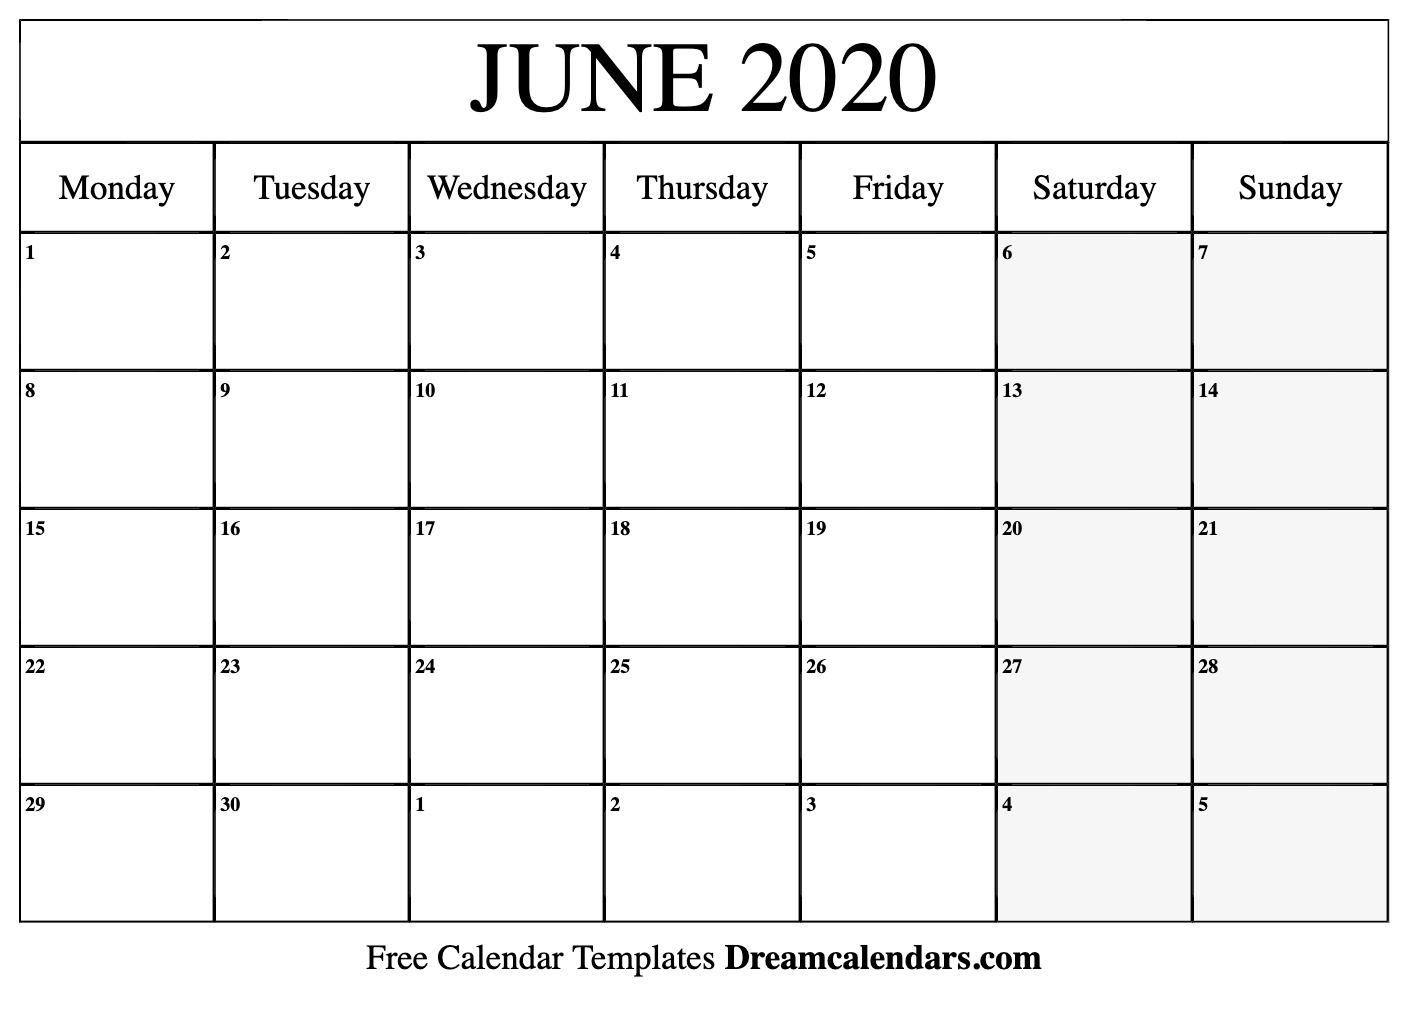 Calendars June 2020 - Wpa.wpart.co